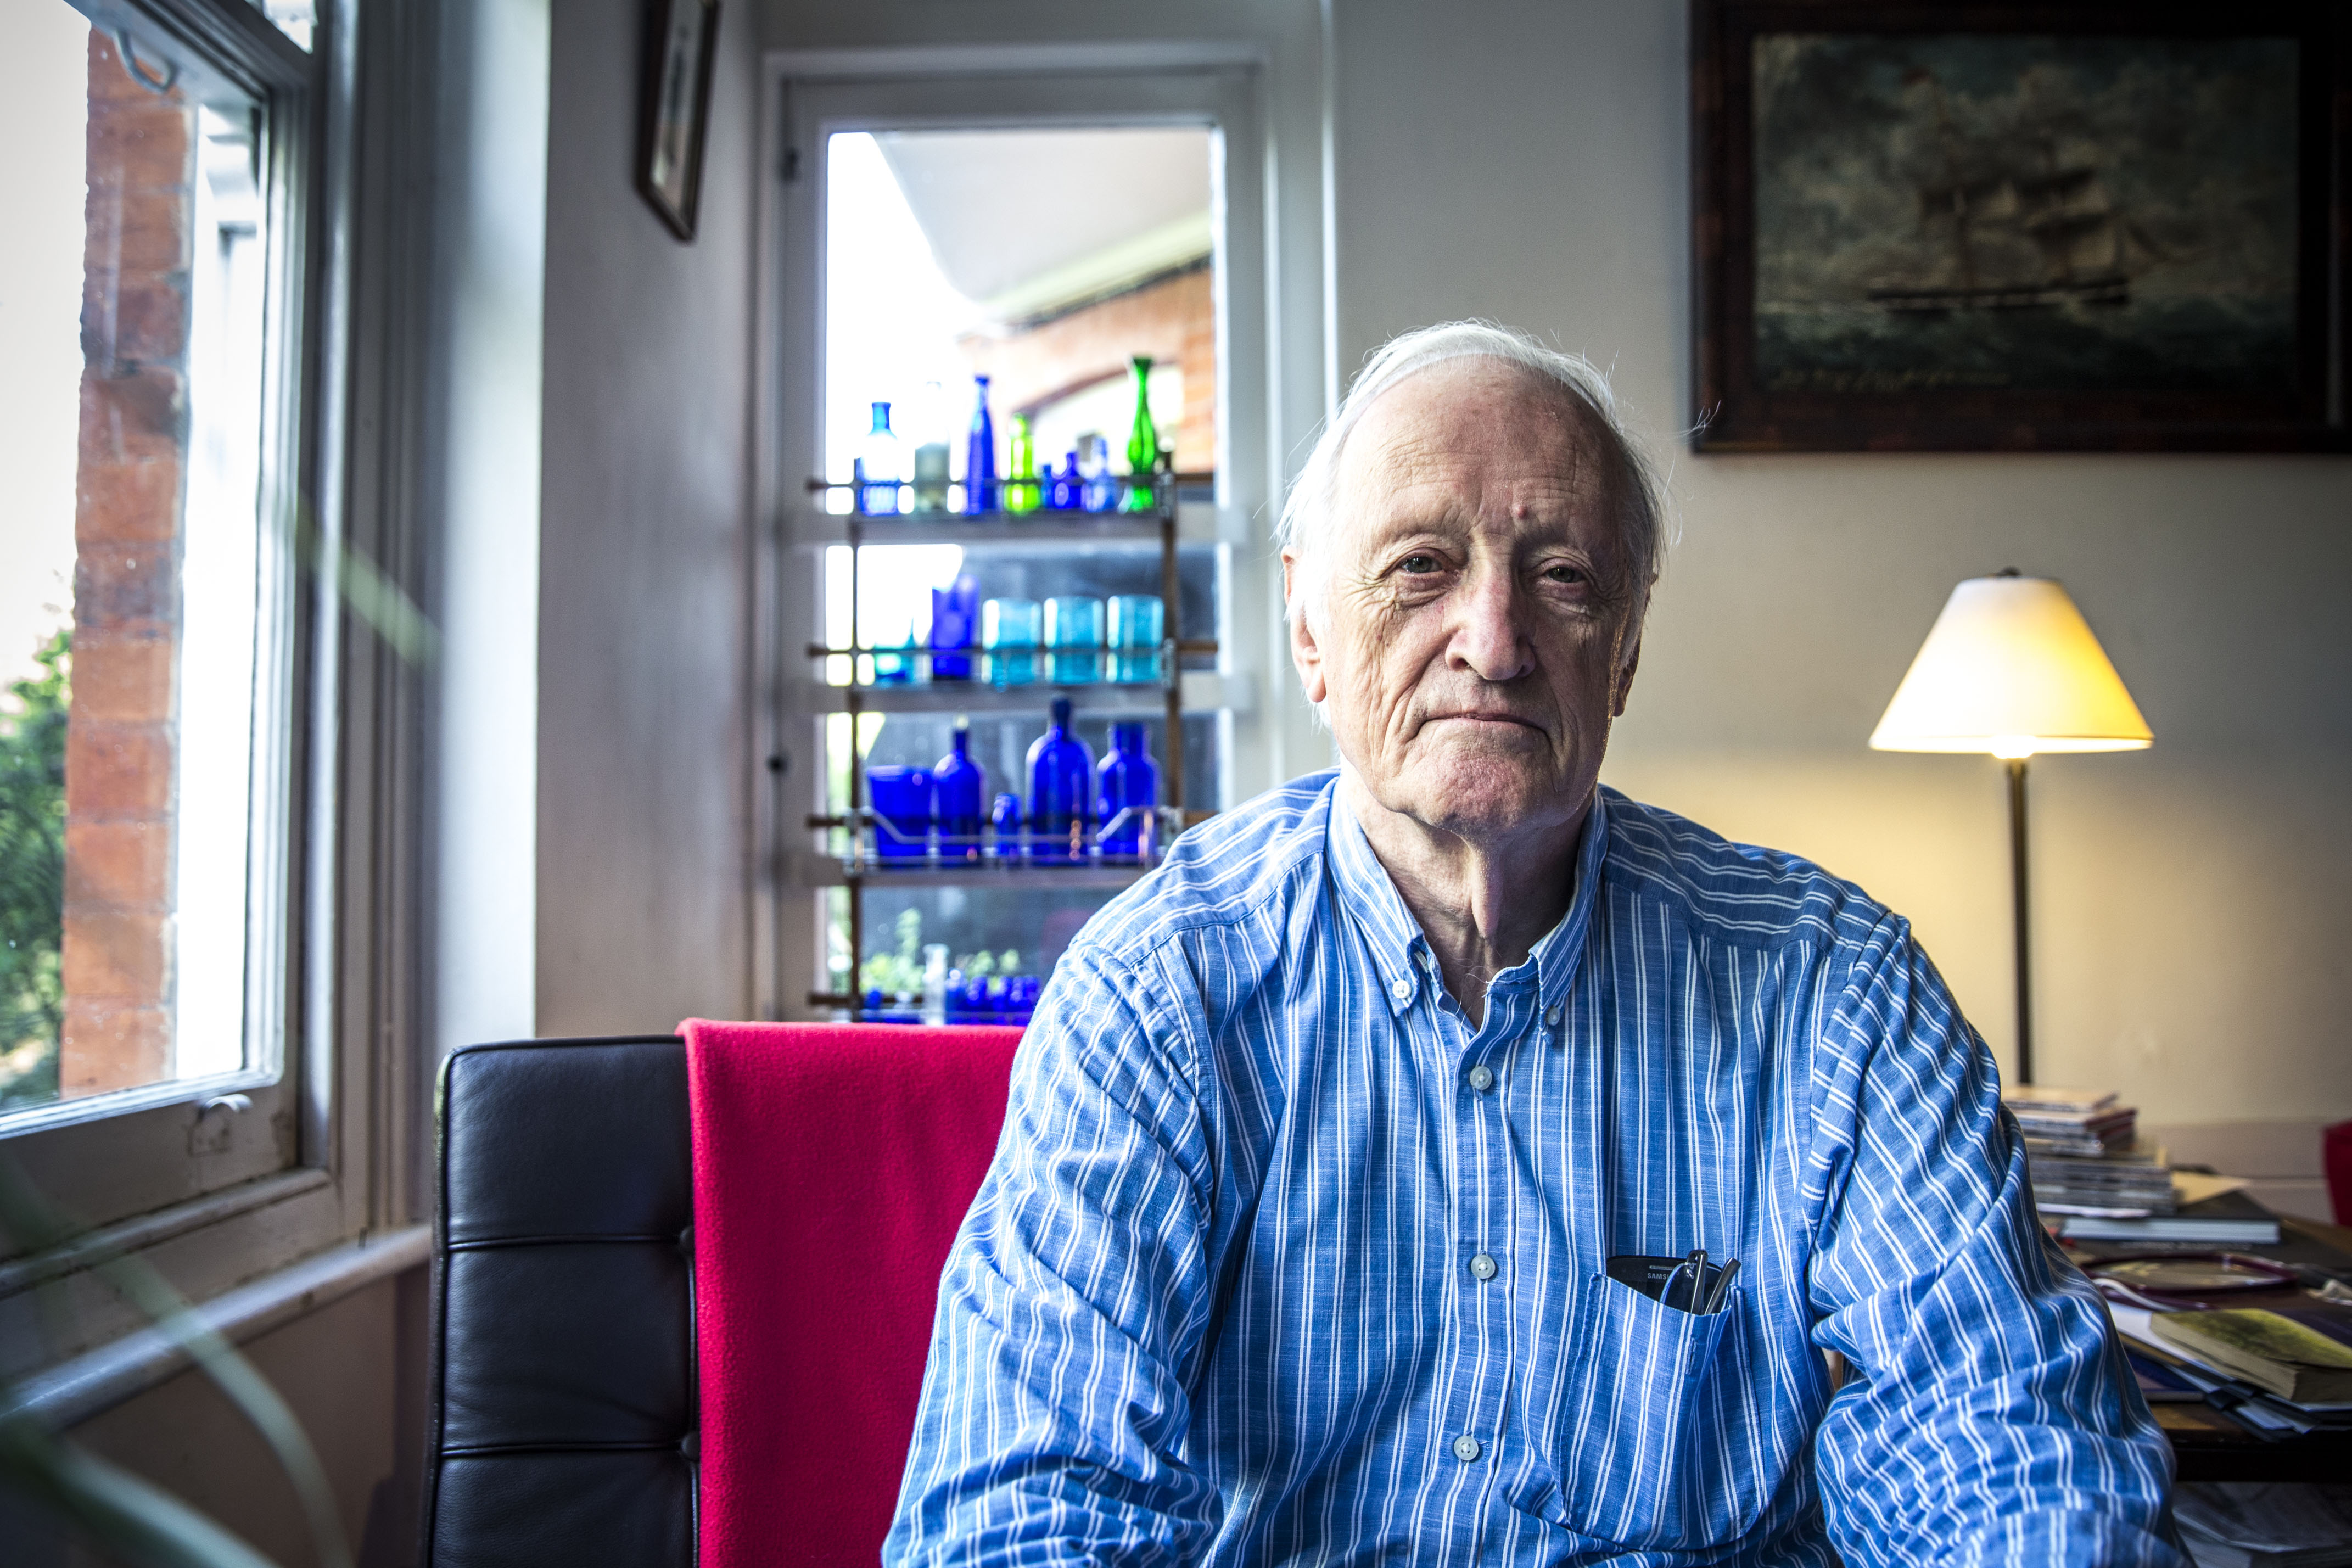 Peter Deakins, architect. (BBC)